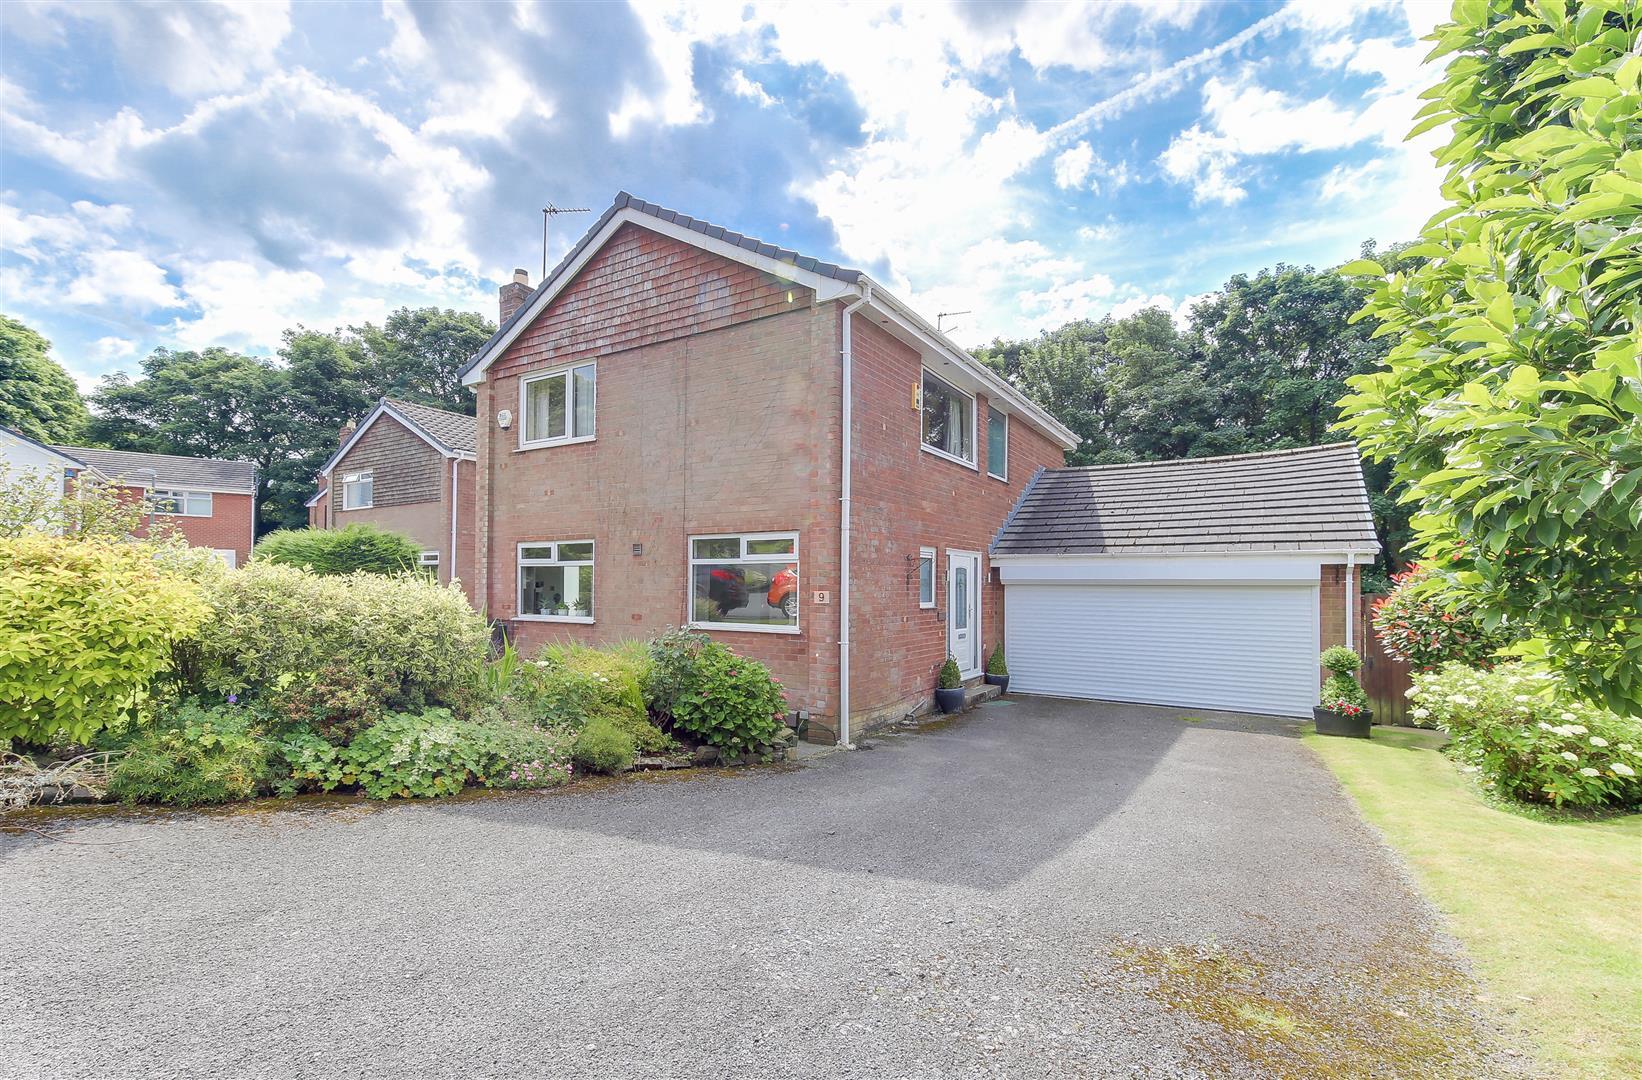 3 Bedrooms Property for sale in Greenbank Park, Rawtenstall, Rossendale